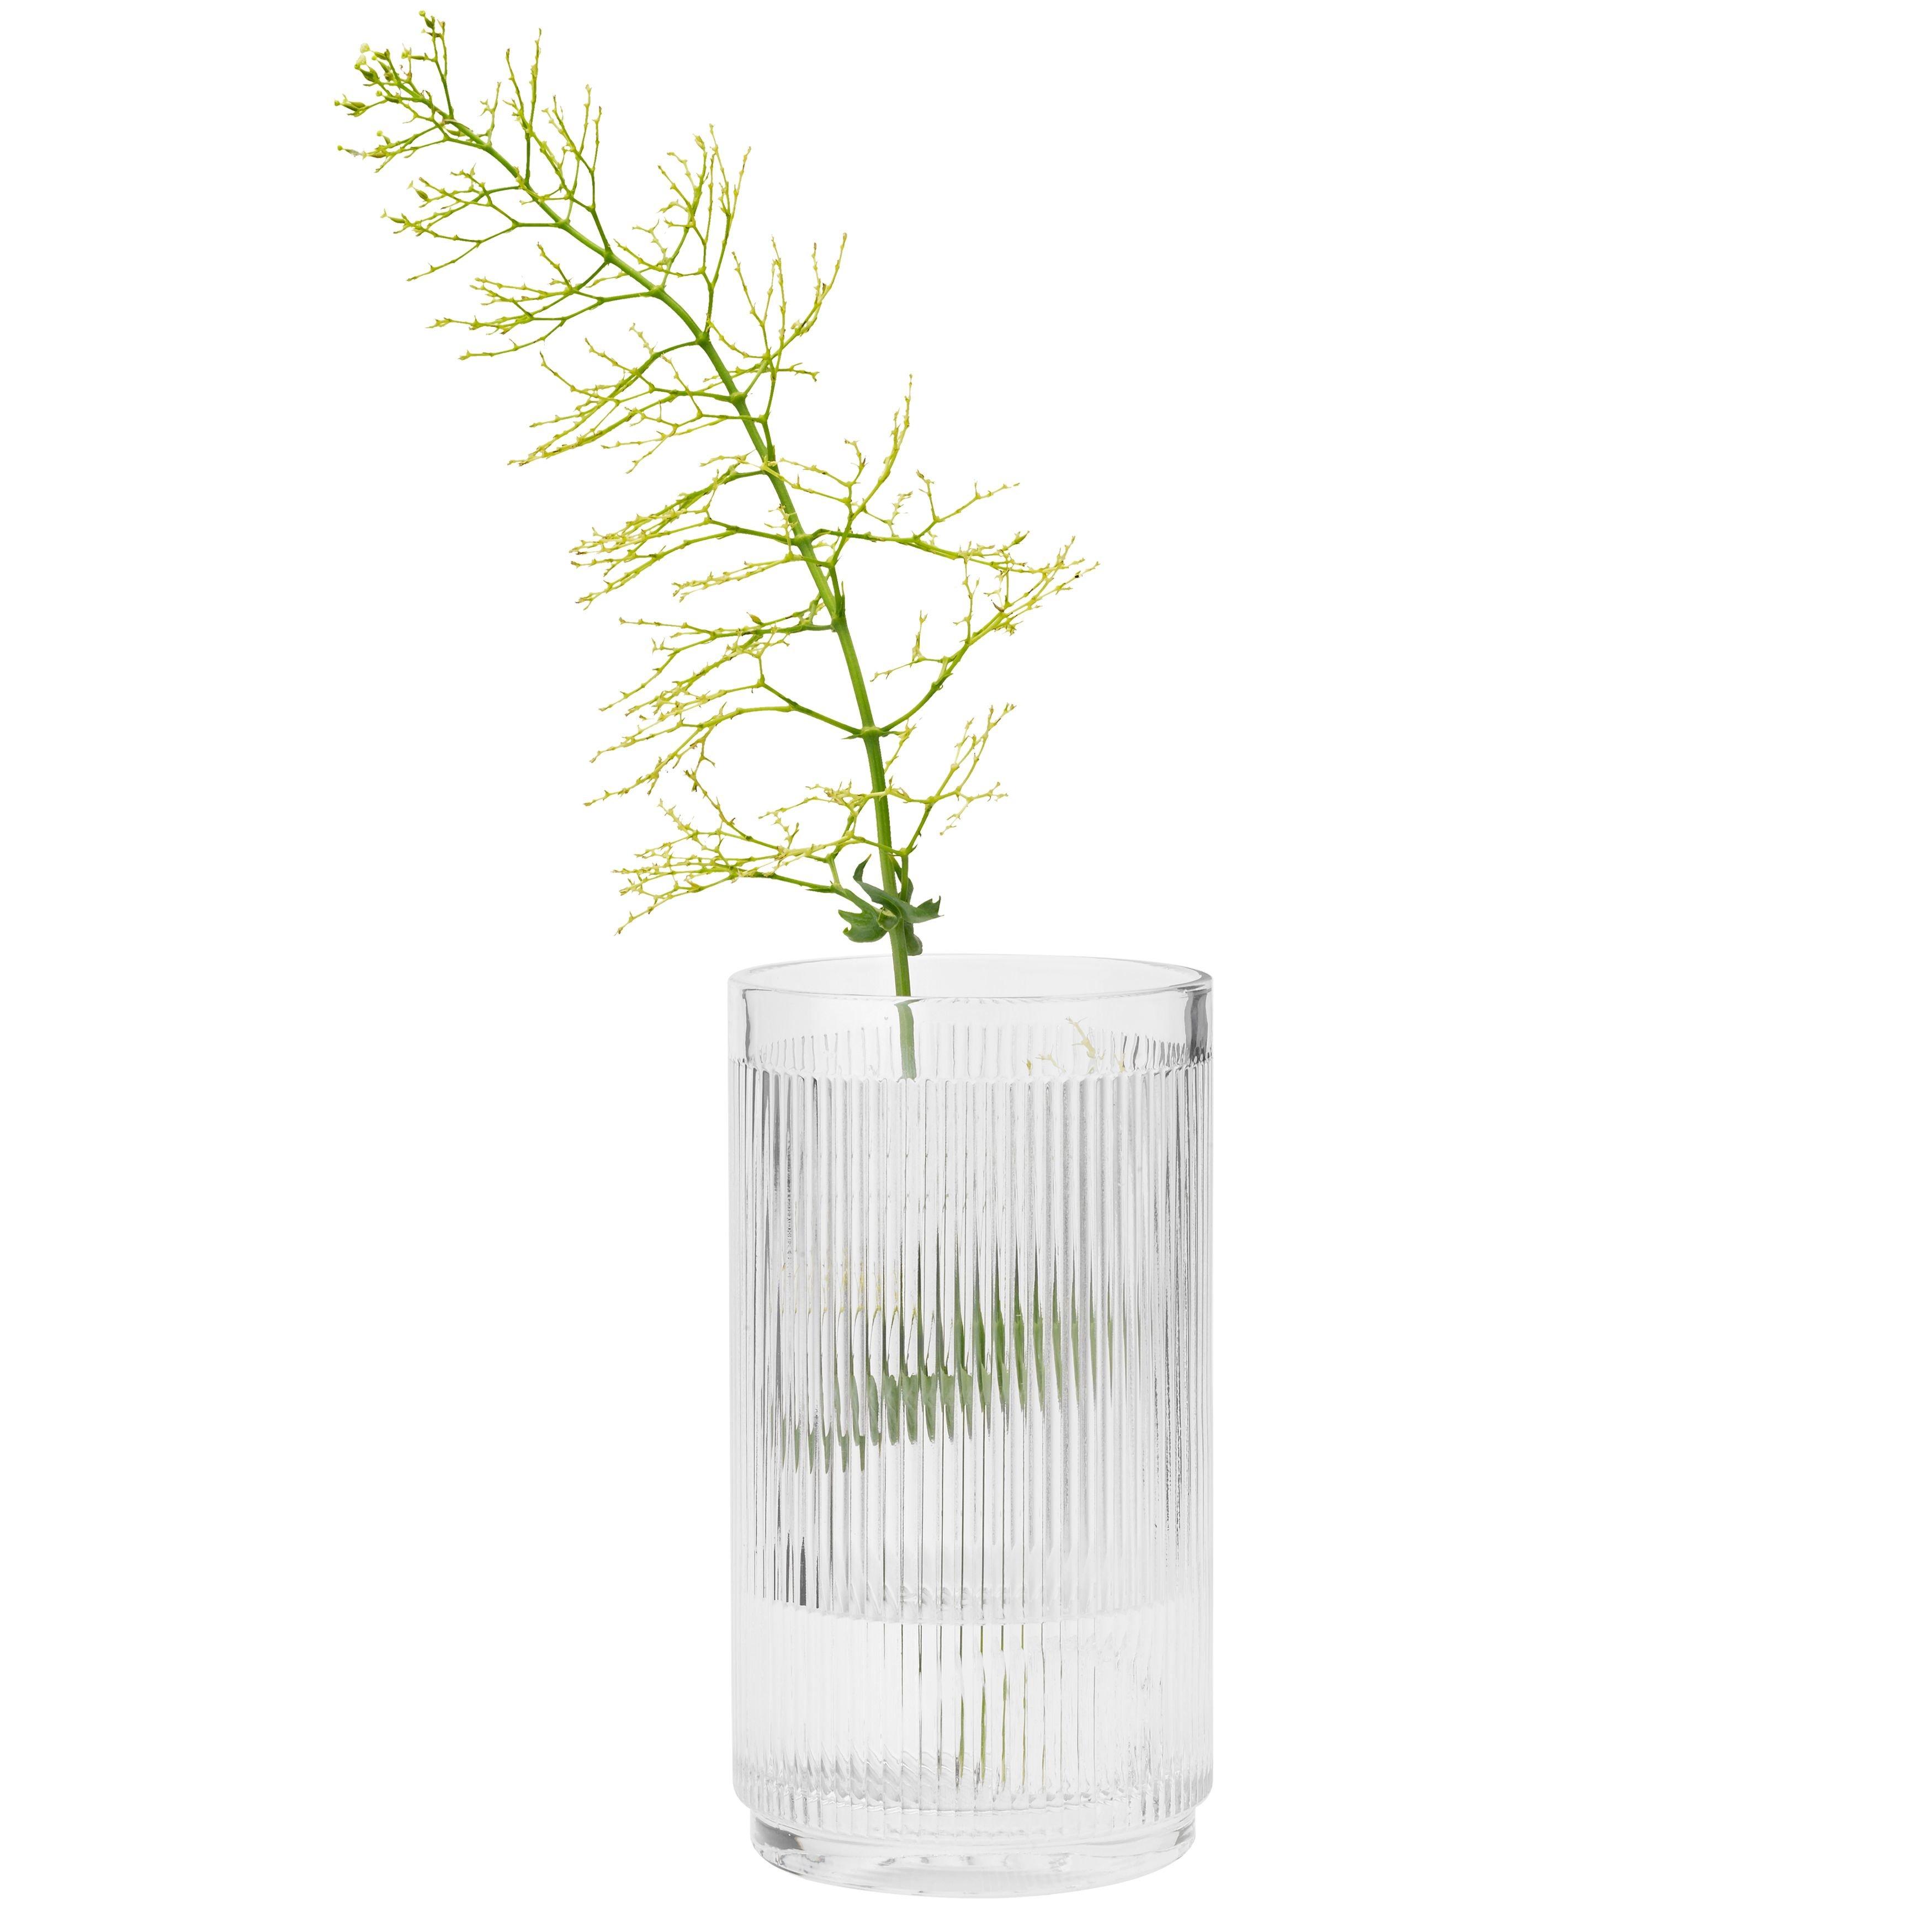 Stelton - Pilastro Drinking Glass 0.33 L - 6 pcs (x-502)